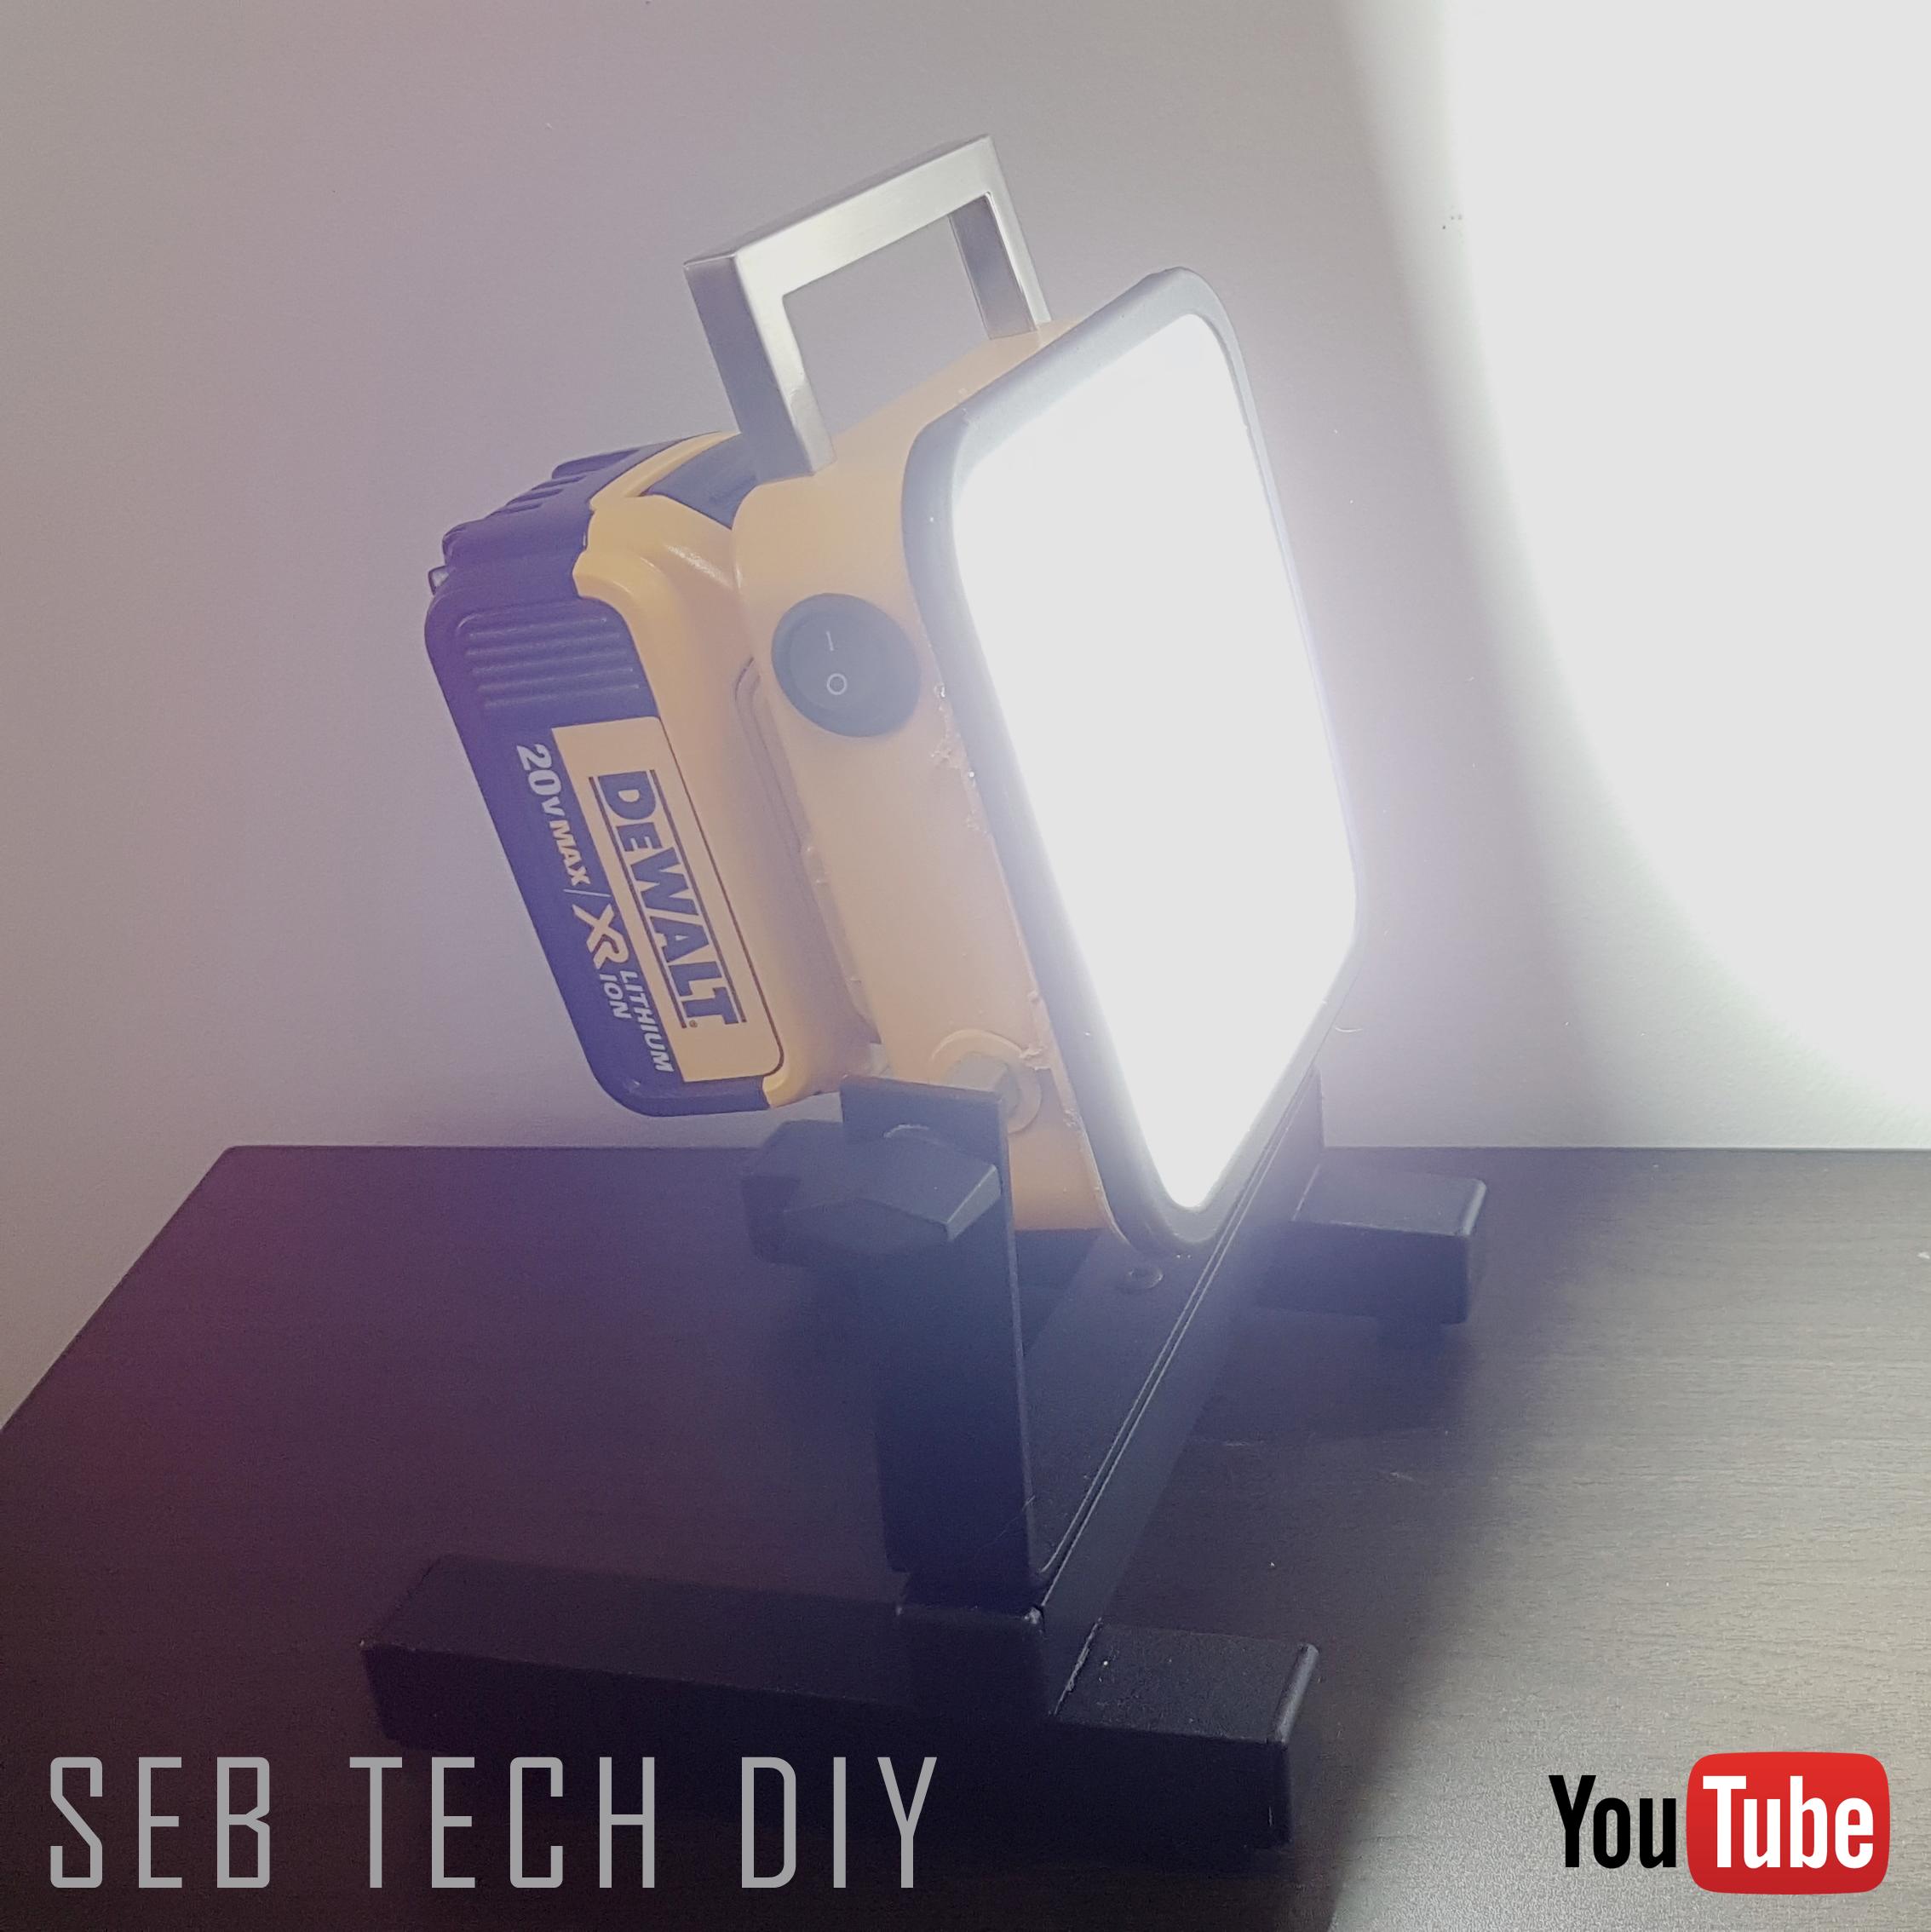 Diy 2000 Lumens Cordless Led Light Works With Dewalt 20v Battery Platform I Made This From A Non Functional Drill Impact Dewalt Led Lighting Diy Led Diy